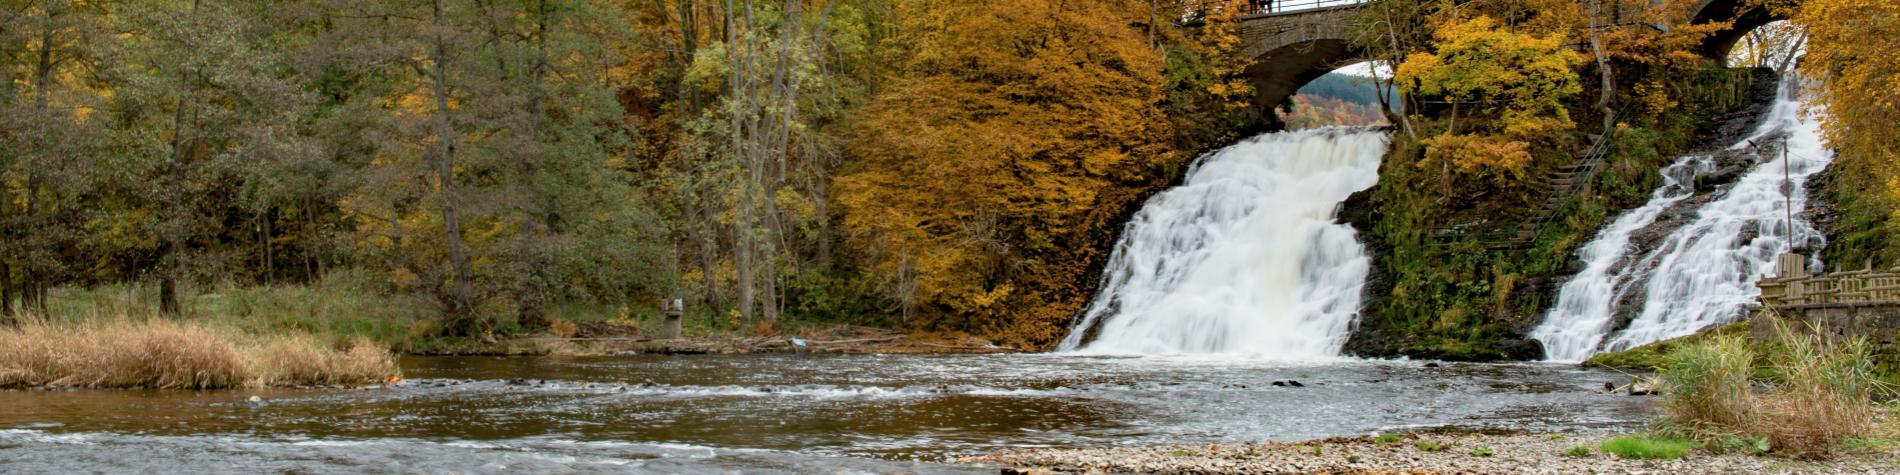 coo-cascade-eau-amblève-automne-nature-jaune-ocre